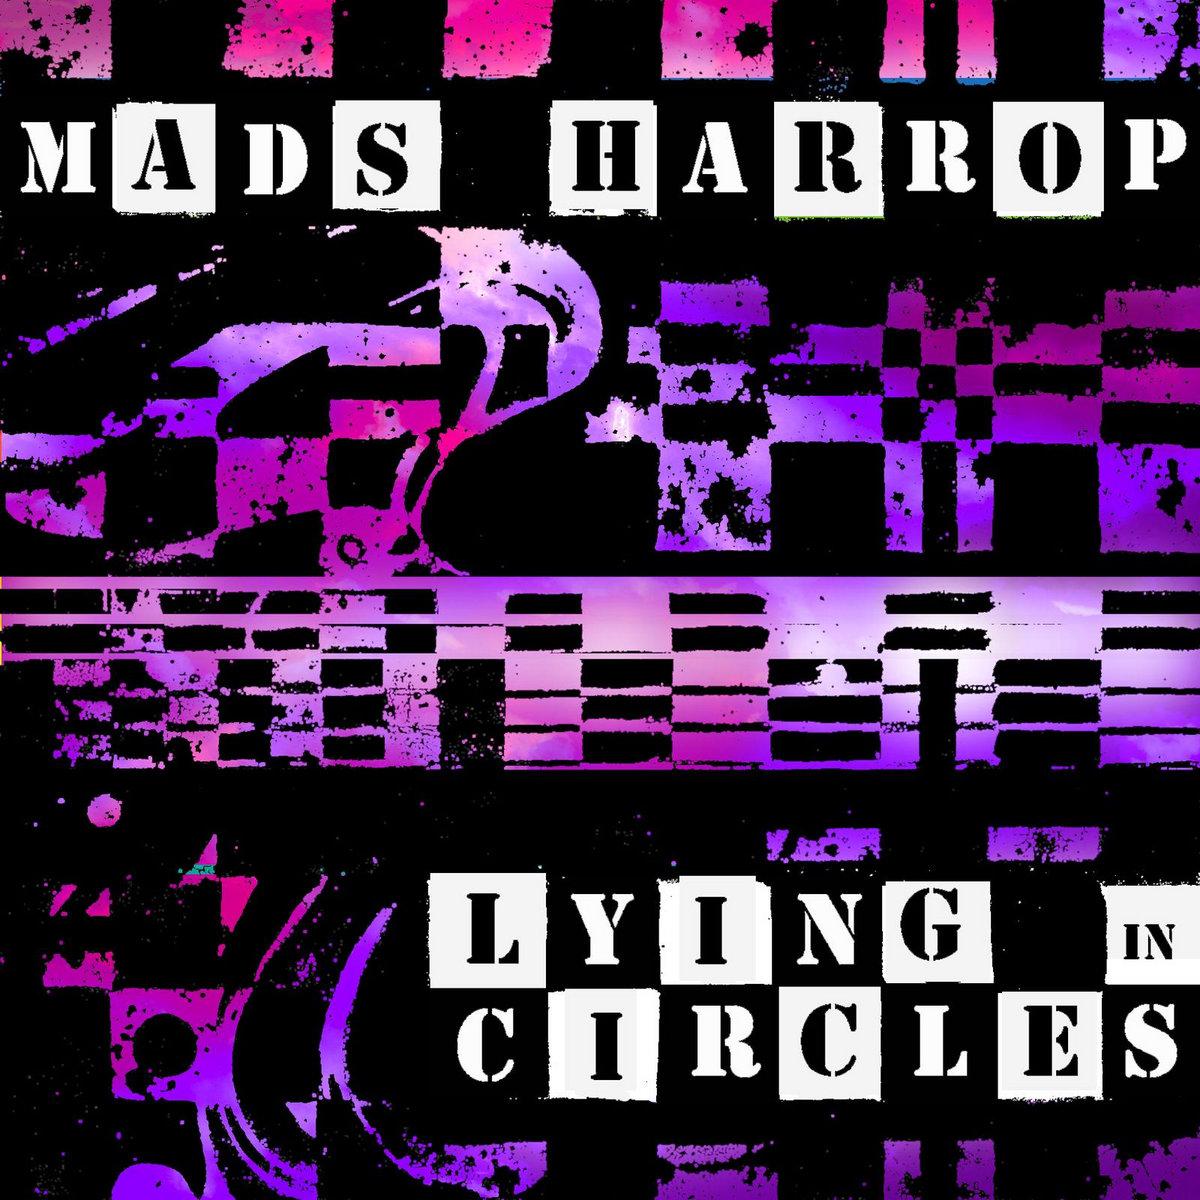 Lying In Circles